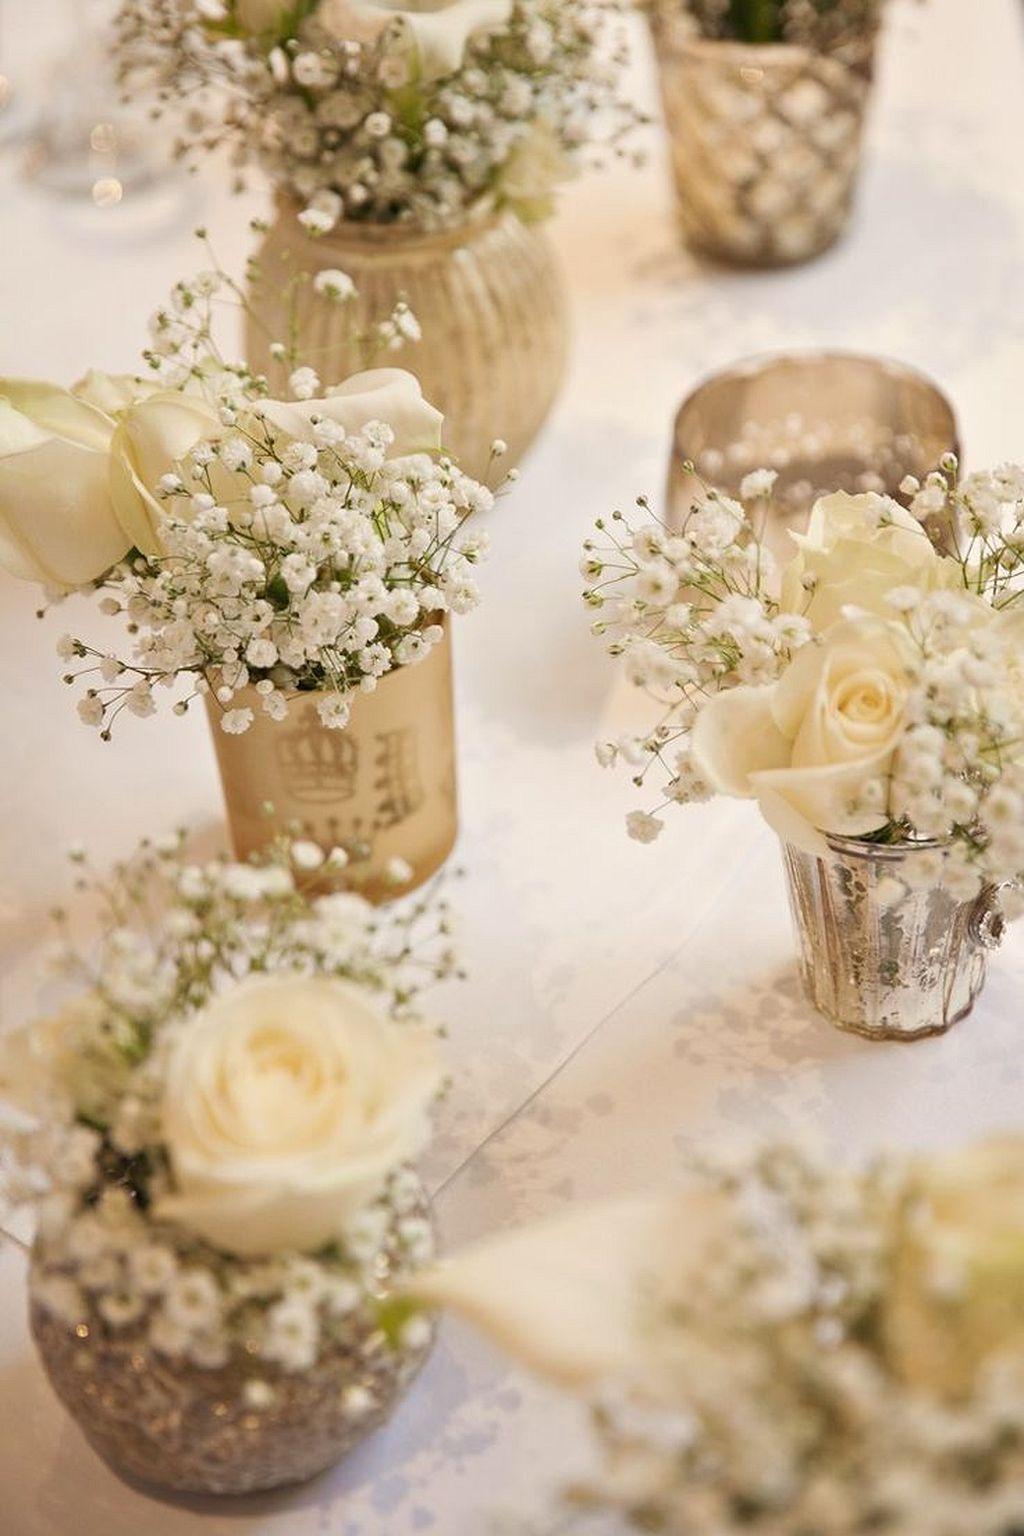 White wedding decoration ideas   elegant floral wedding centerpiece ideas   Floral wedding